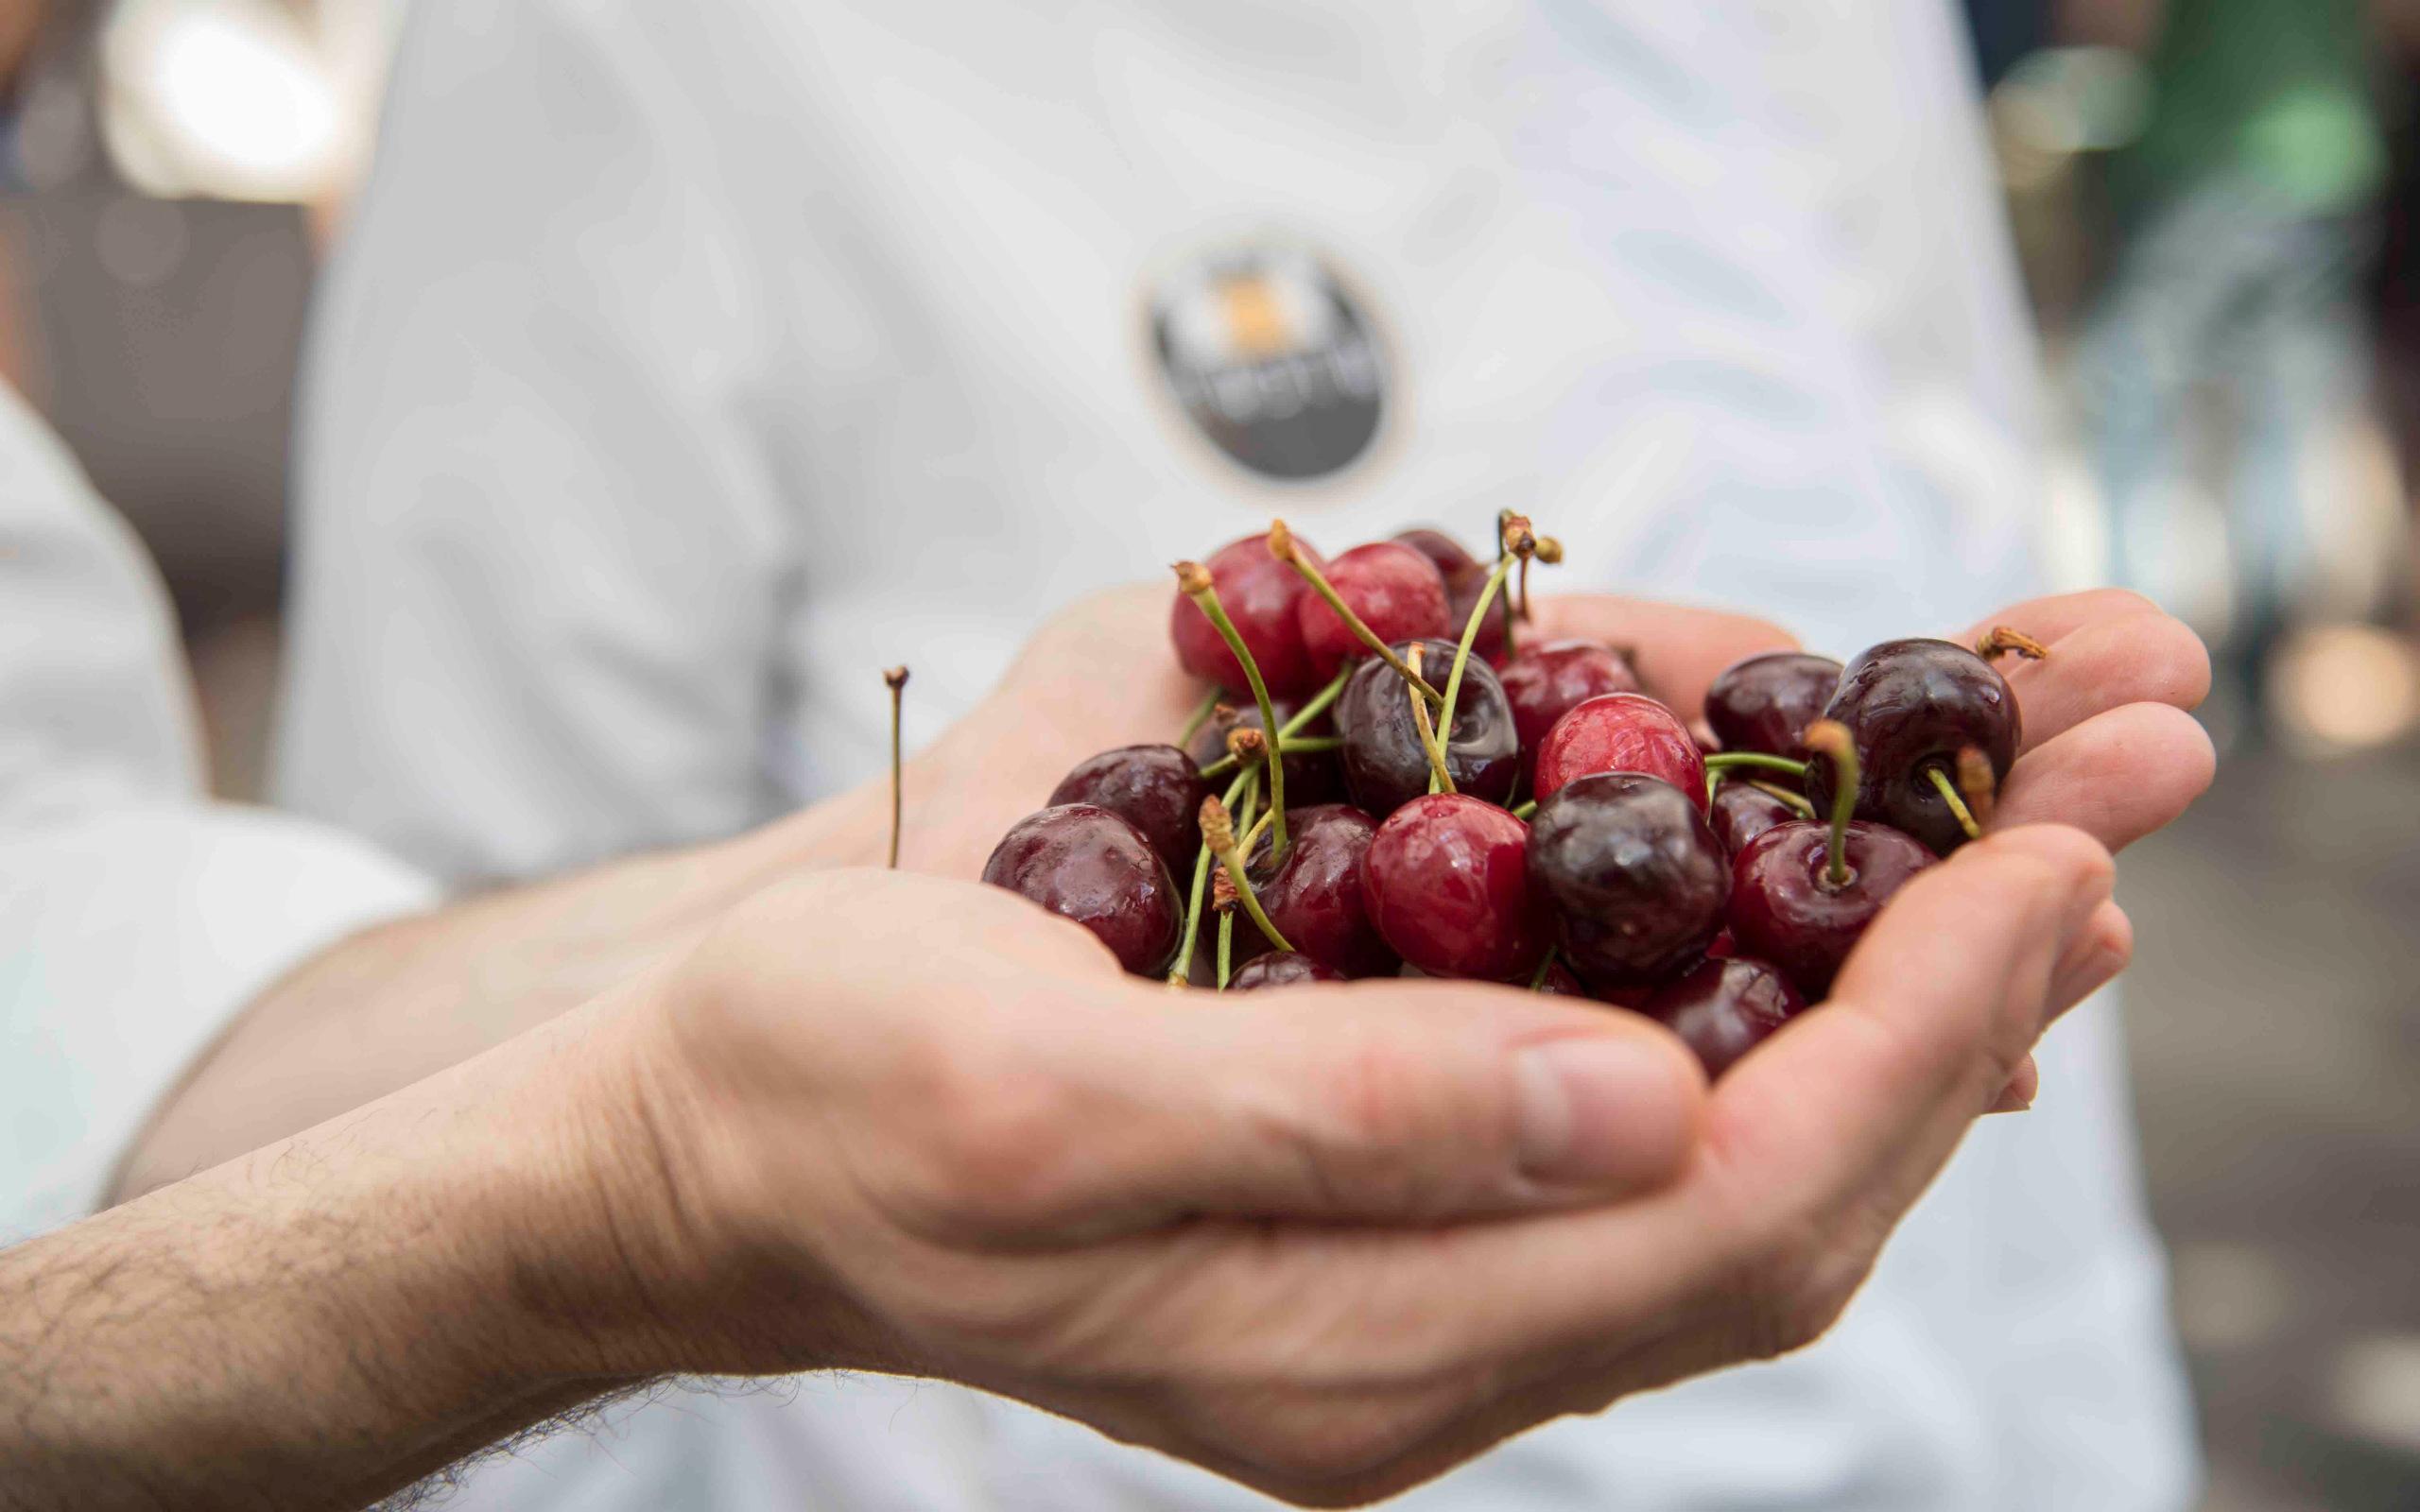 Cherries - ©Giampaolo Mavilia